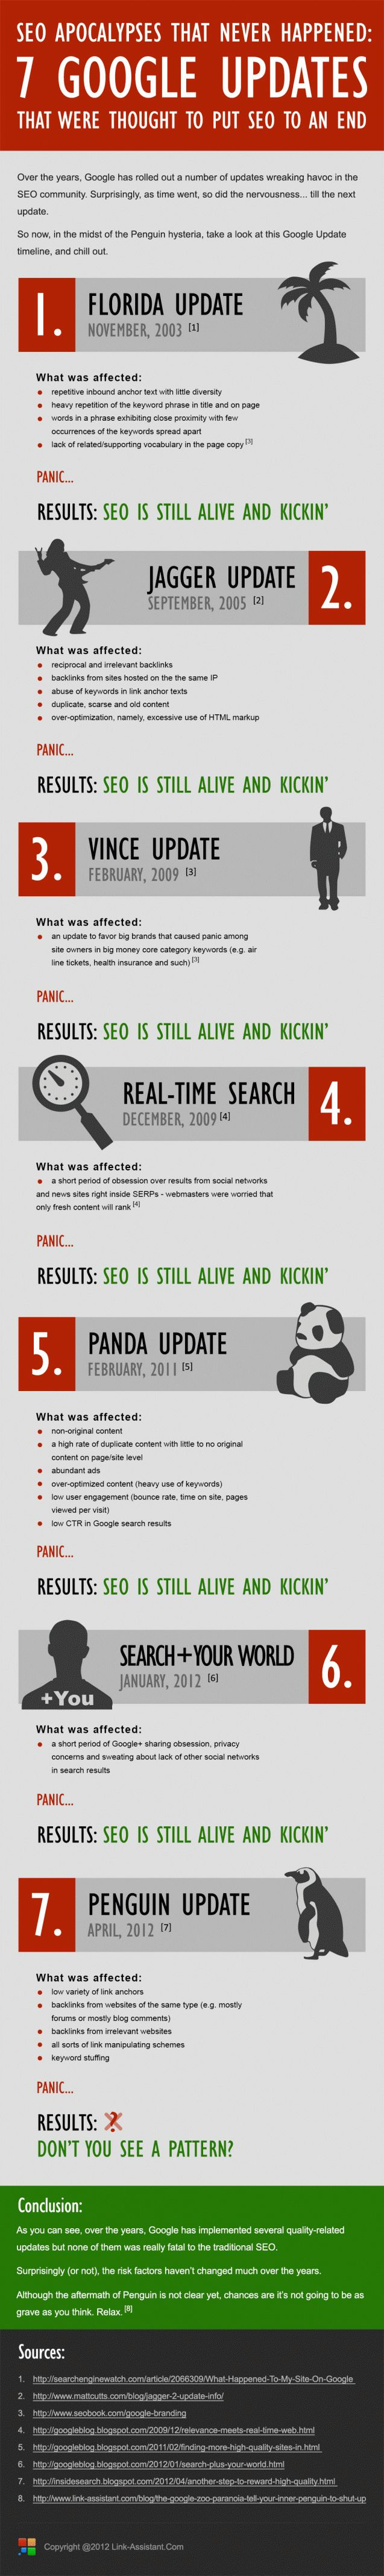 SEO Apocalypses That Never happened. #Infographic